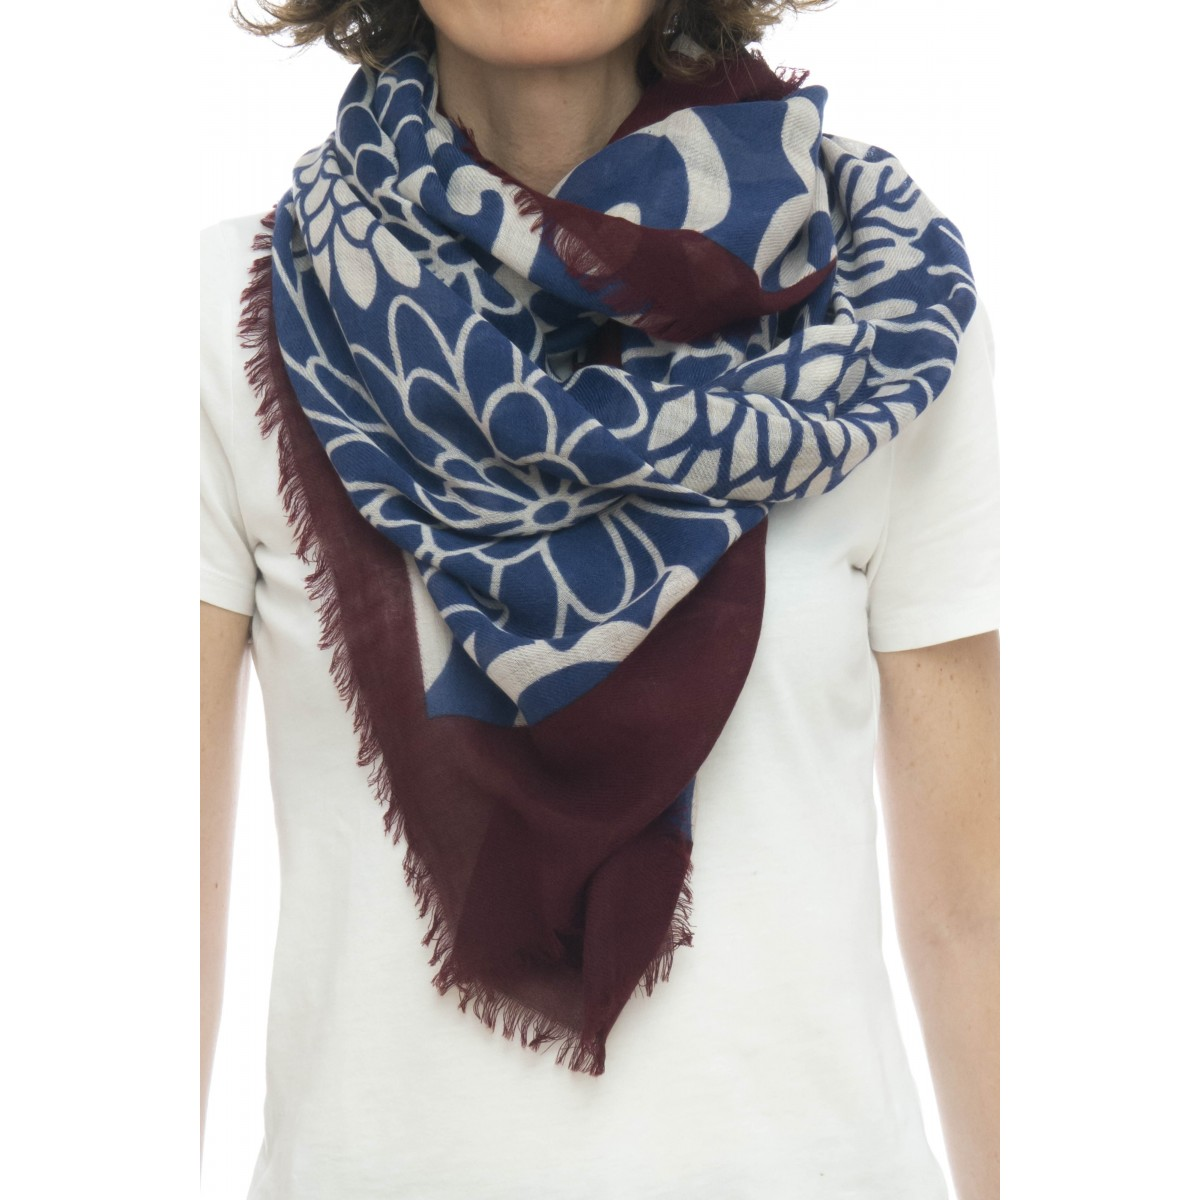 Sciarpa - Ortensia 4563   90 x 200 , 93% lana e 7% seta